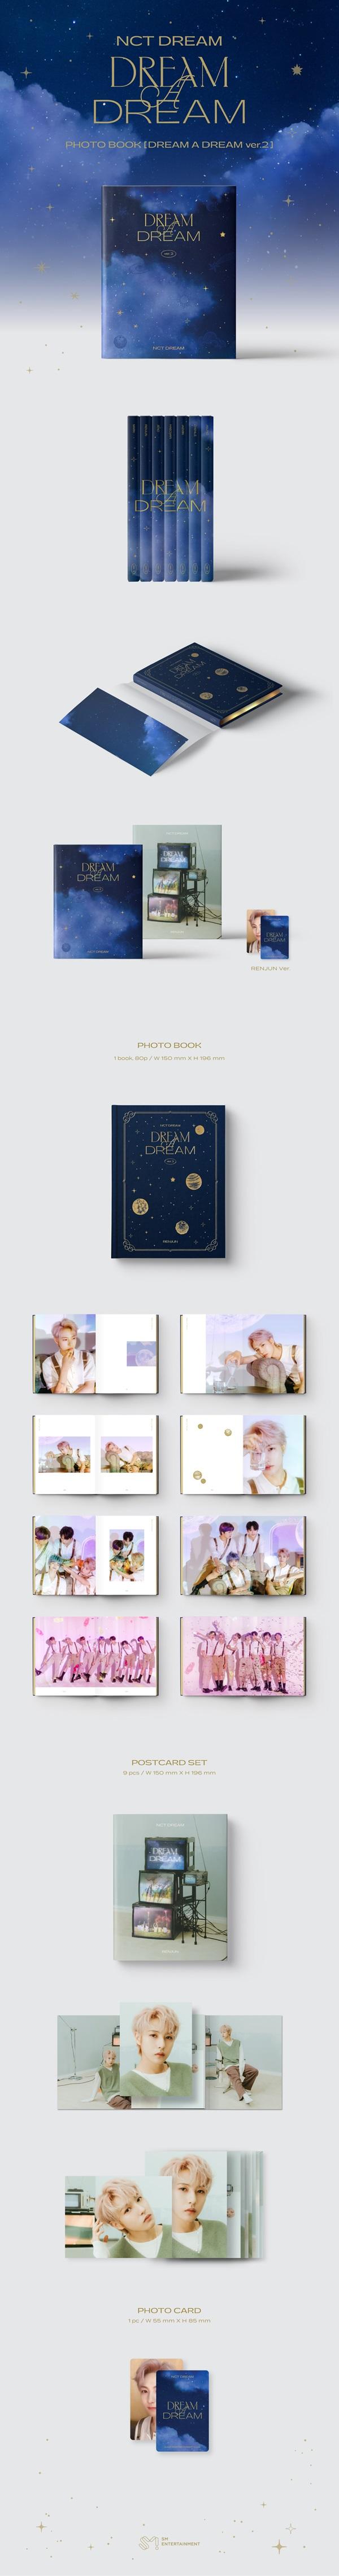 NCT DREAM PHOTO BOOK [DREAM A DREAM ver.2]: RENJUN Ver.